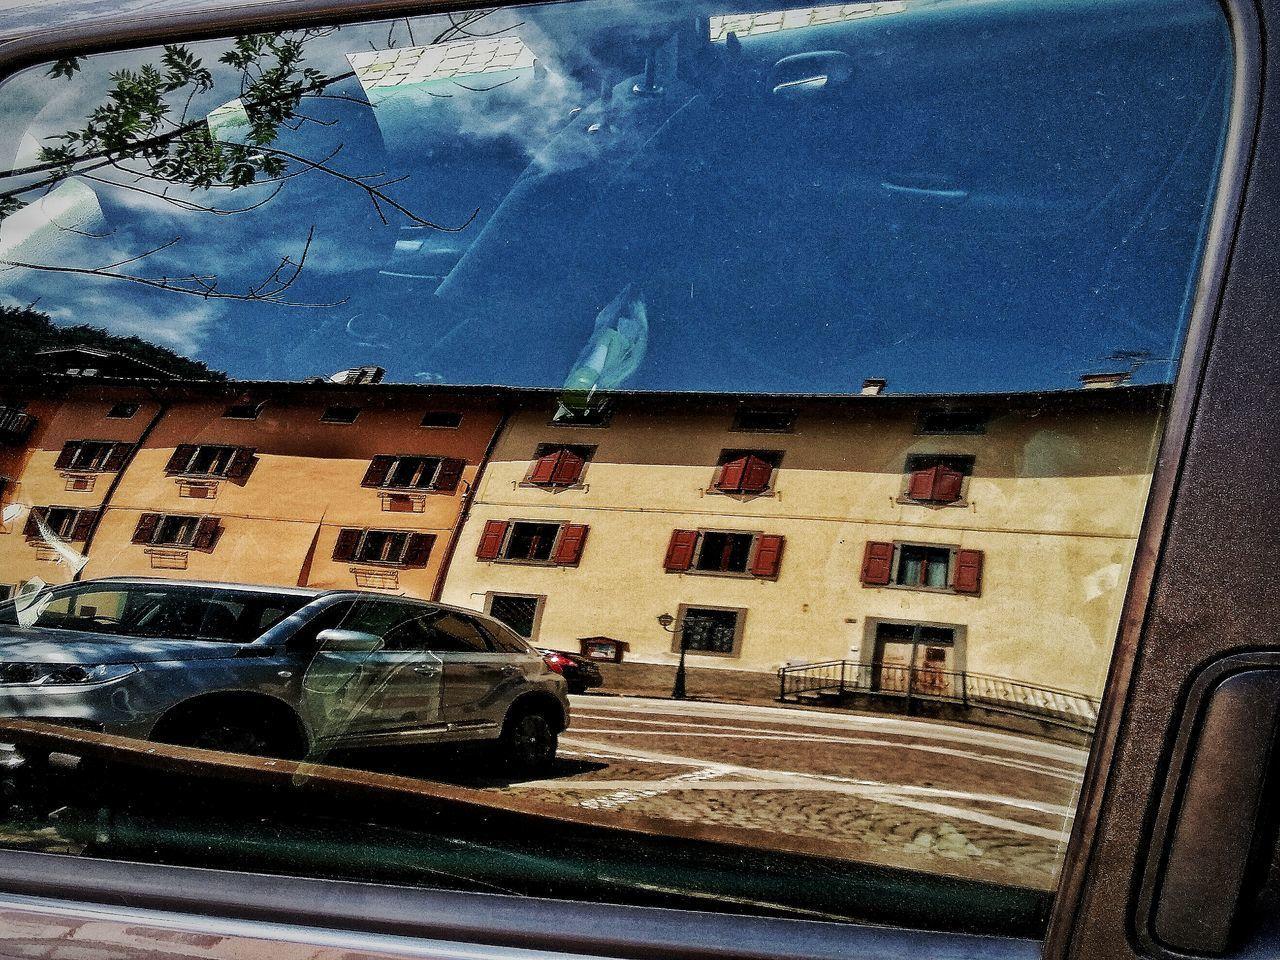 BUILDINGS SEEN THROUGH GLASS WINDOW OF CAR